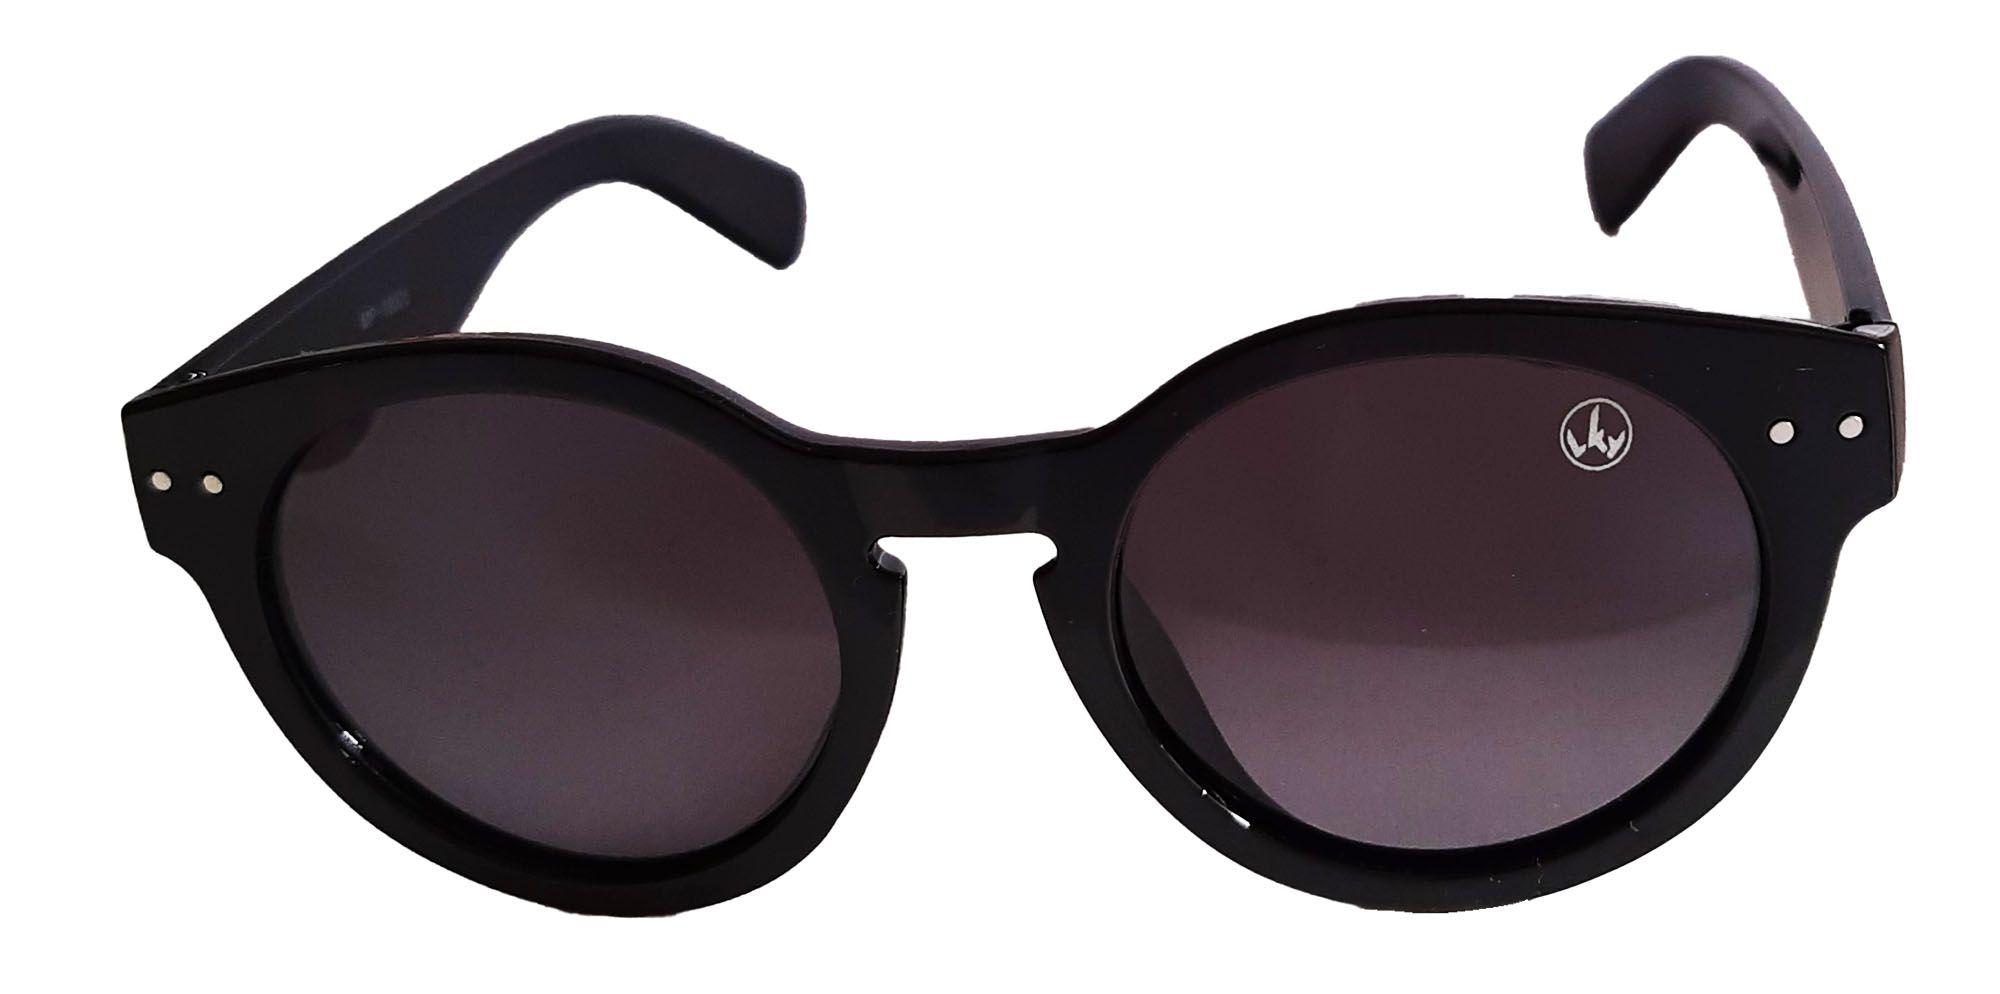 Óculos de sol polarizadol Lucky18025